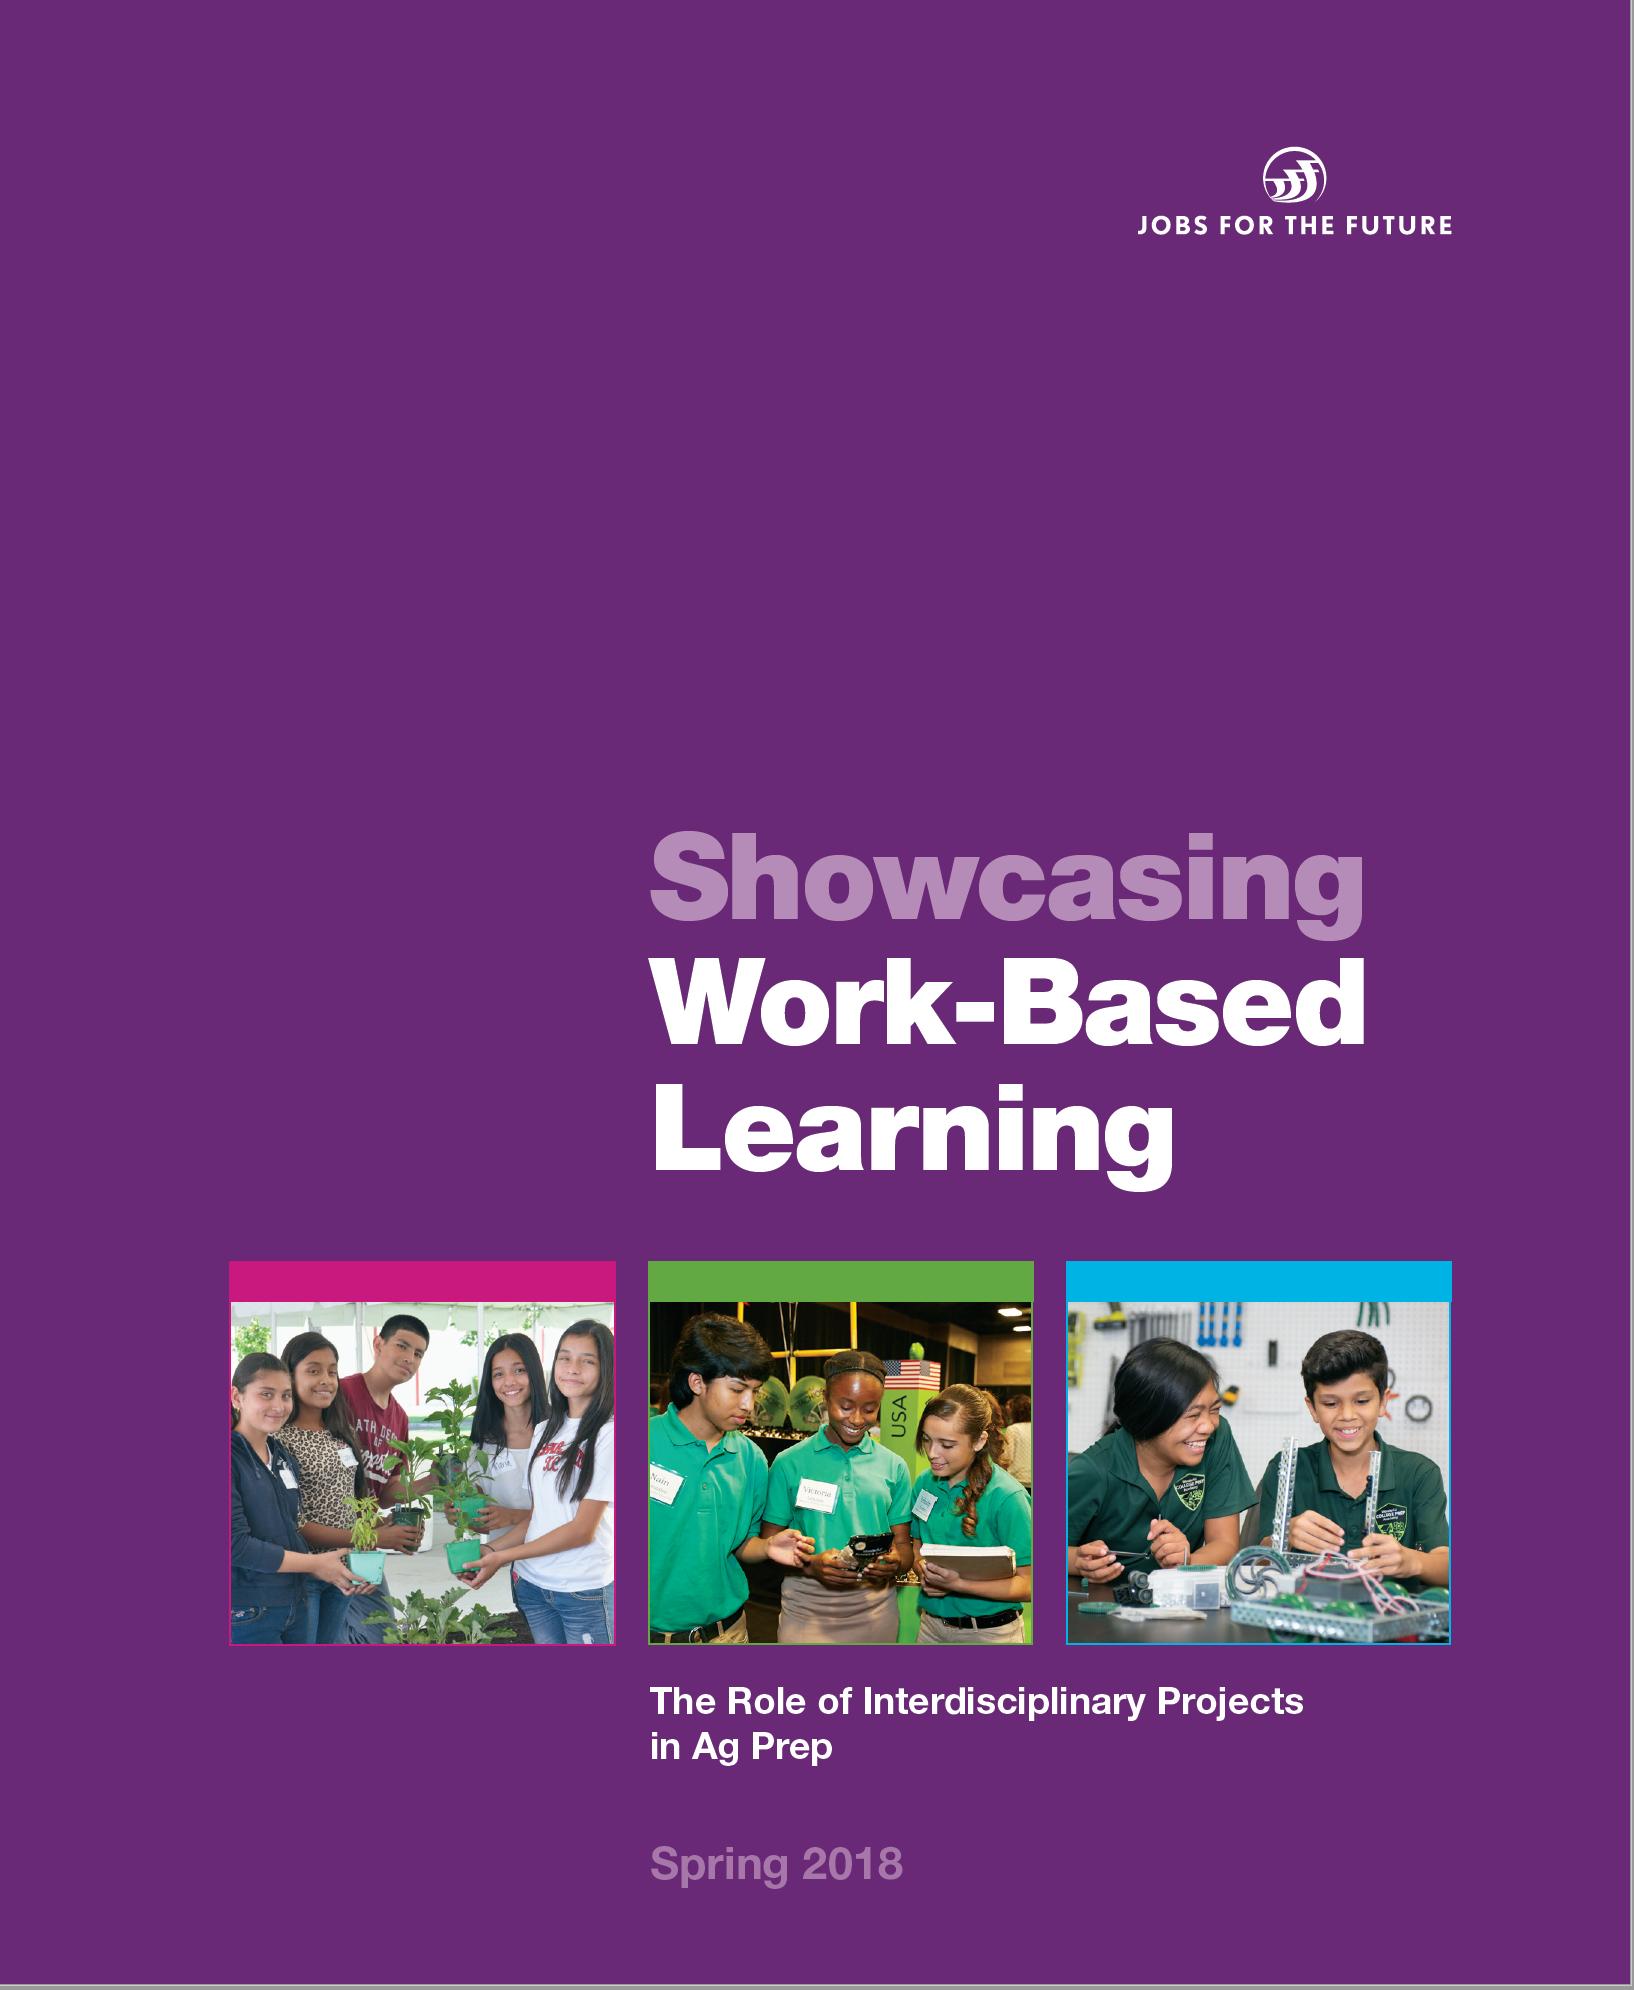 Showcasing Work-Based Learning